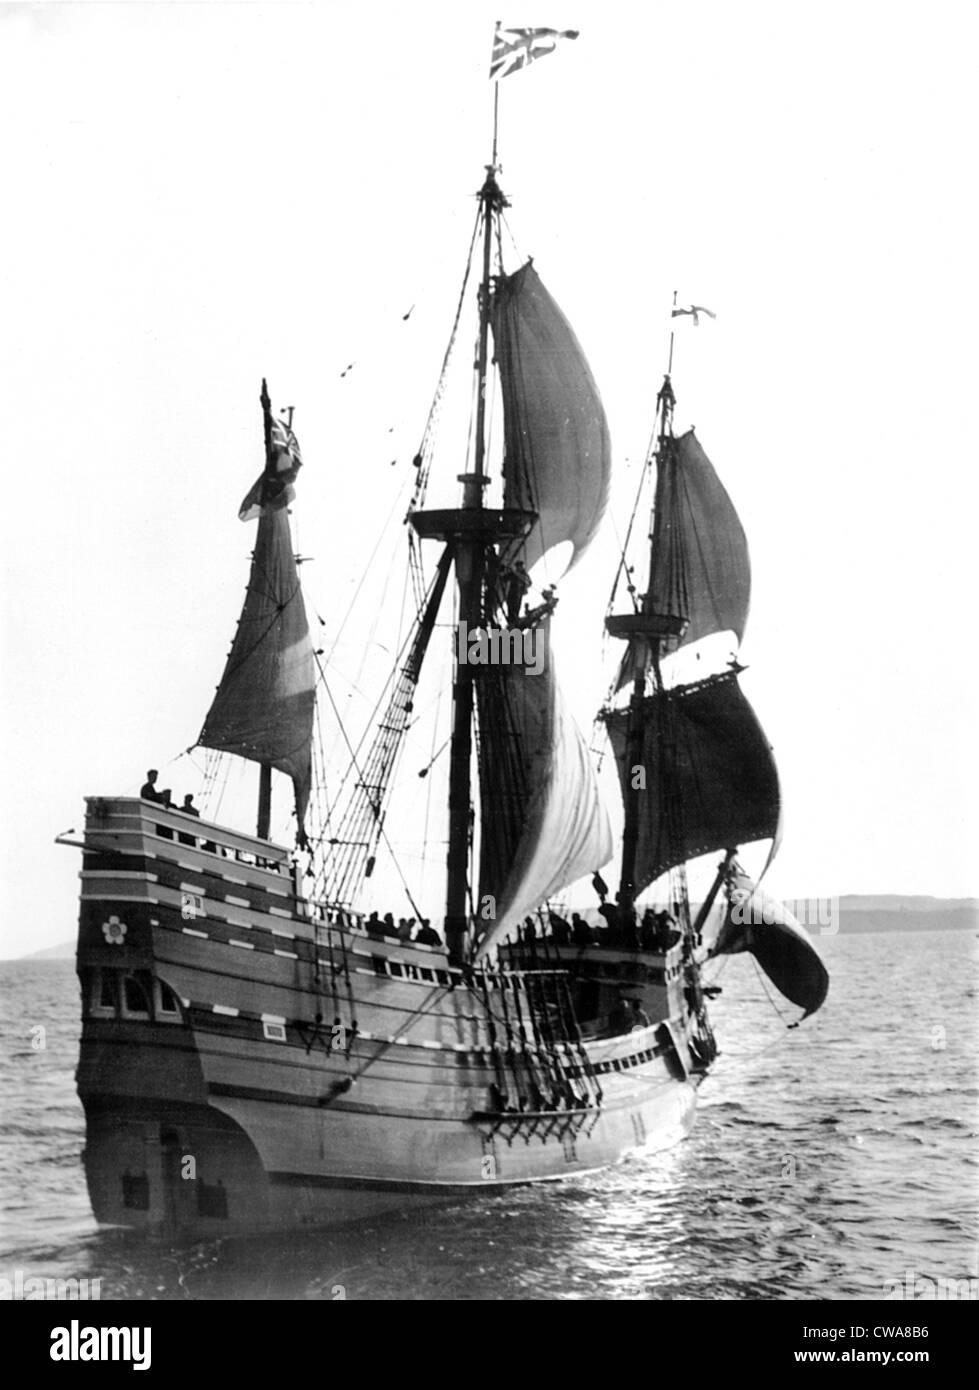 Mayflower II, Plymouth Harbor, Plymouth, England, 1957. Höflichkeit: CSU Archive / Everett Collection Stockfoto